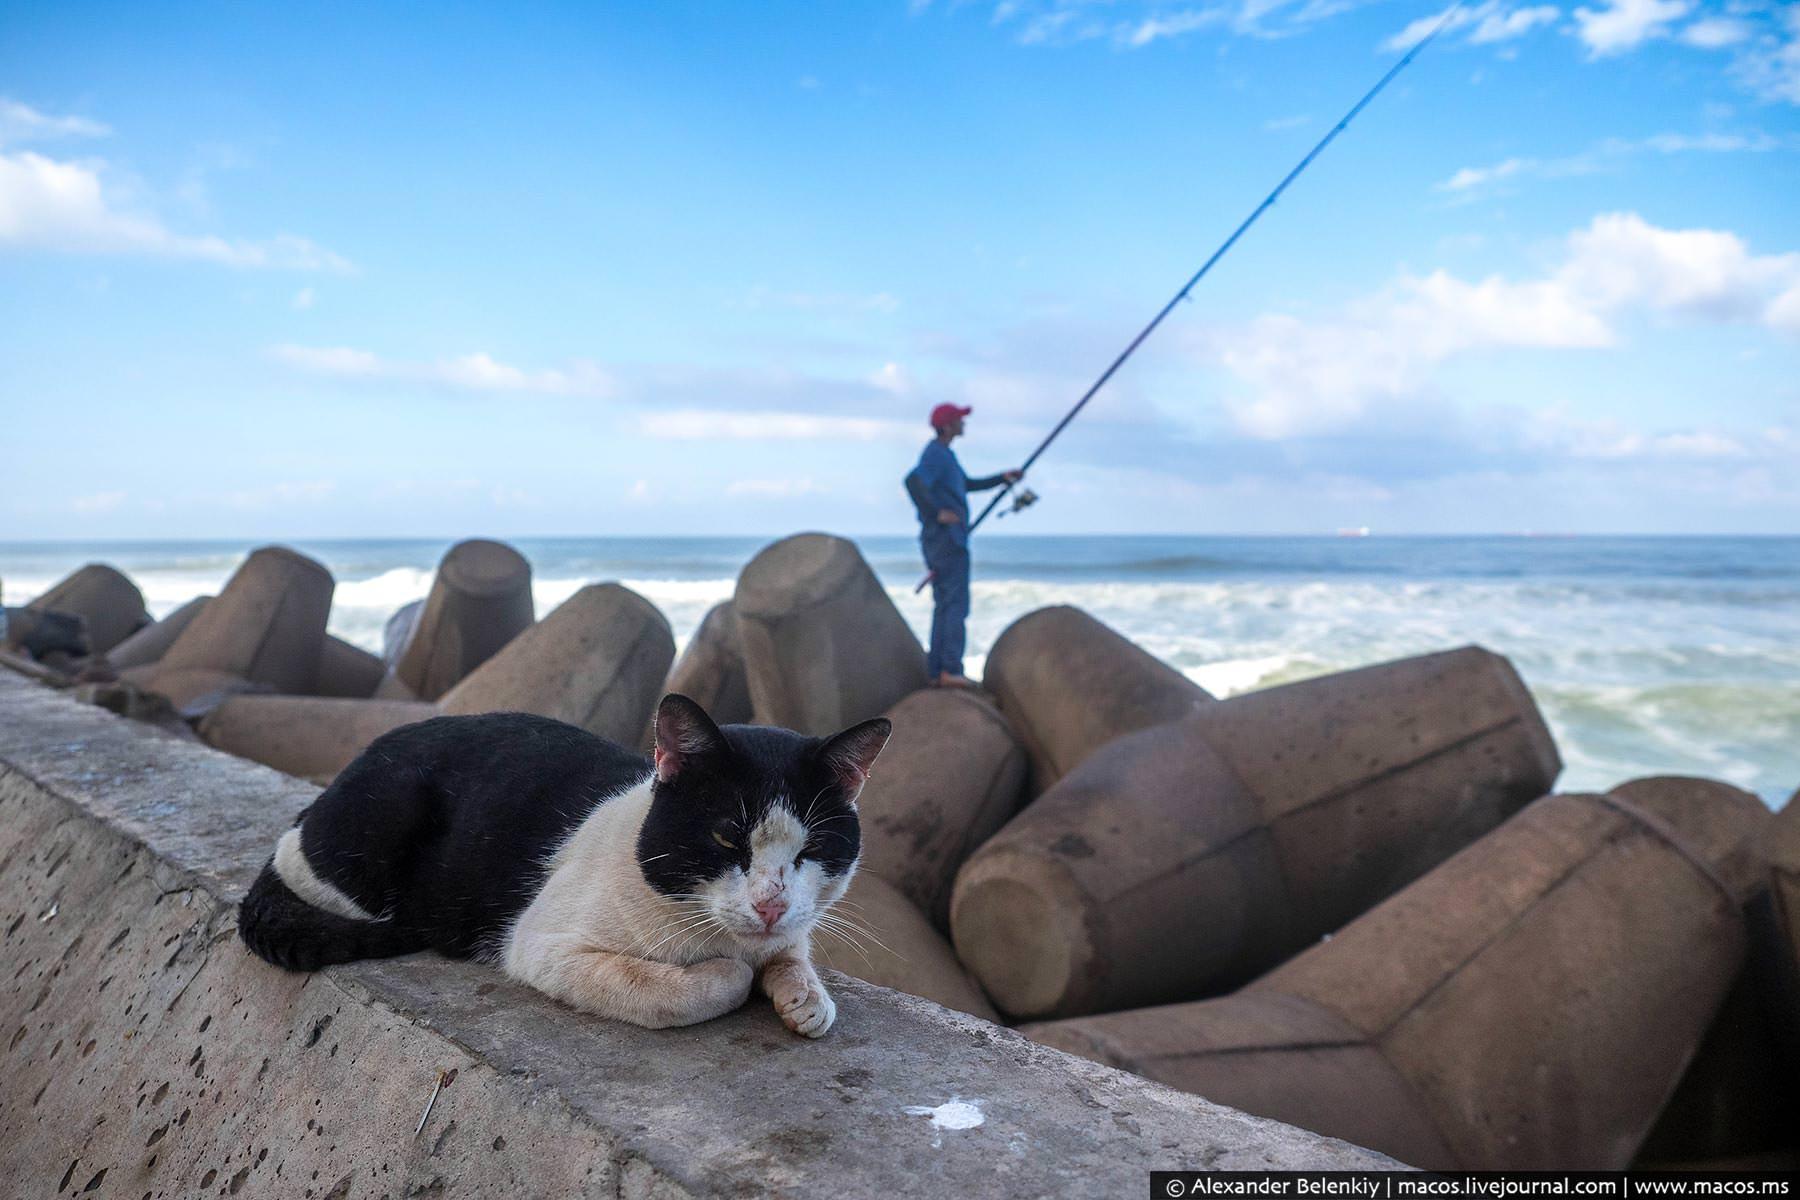 Фото: Кот на набережной